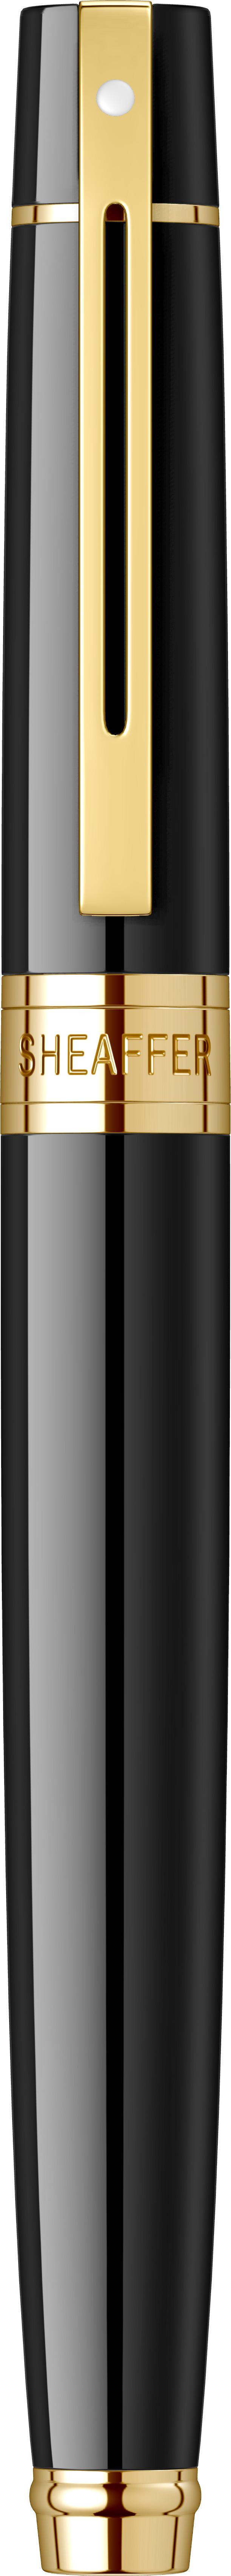 Glossy Black GT